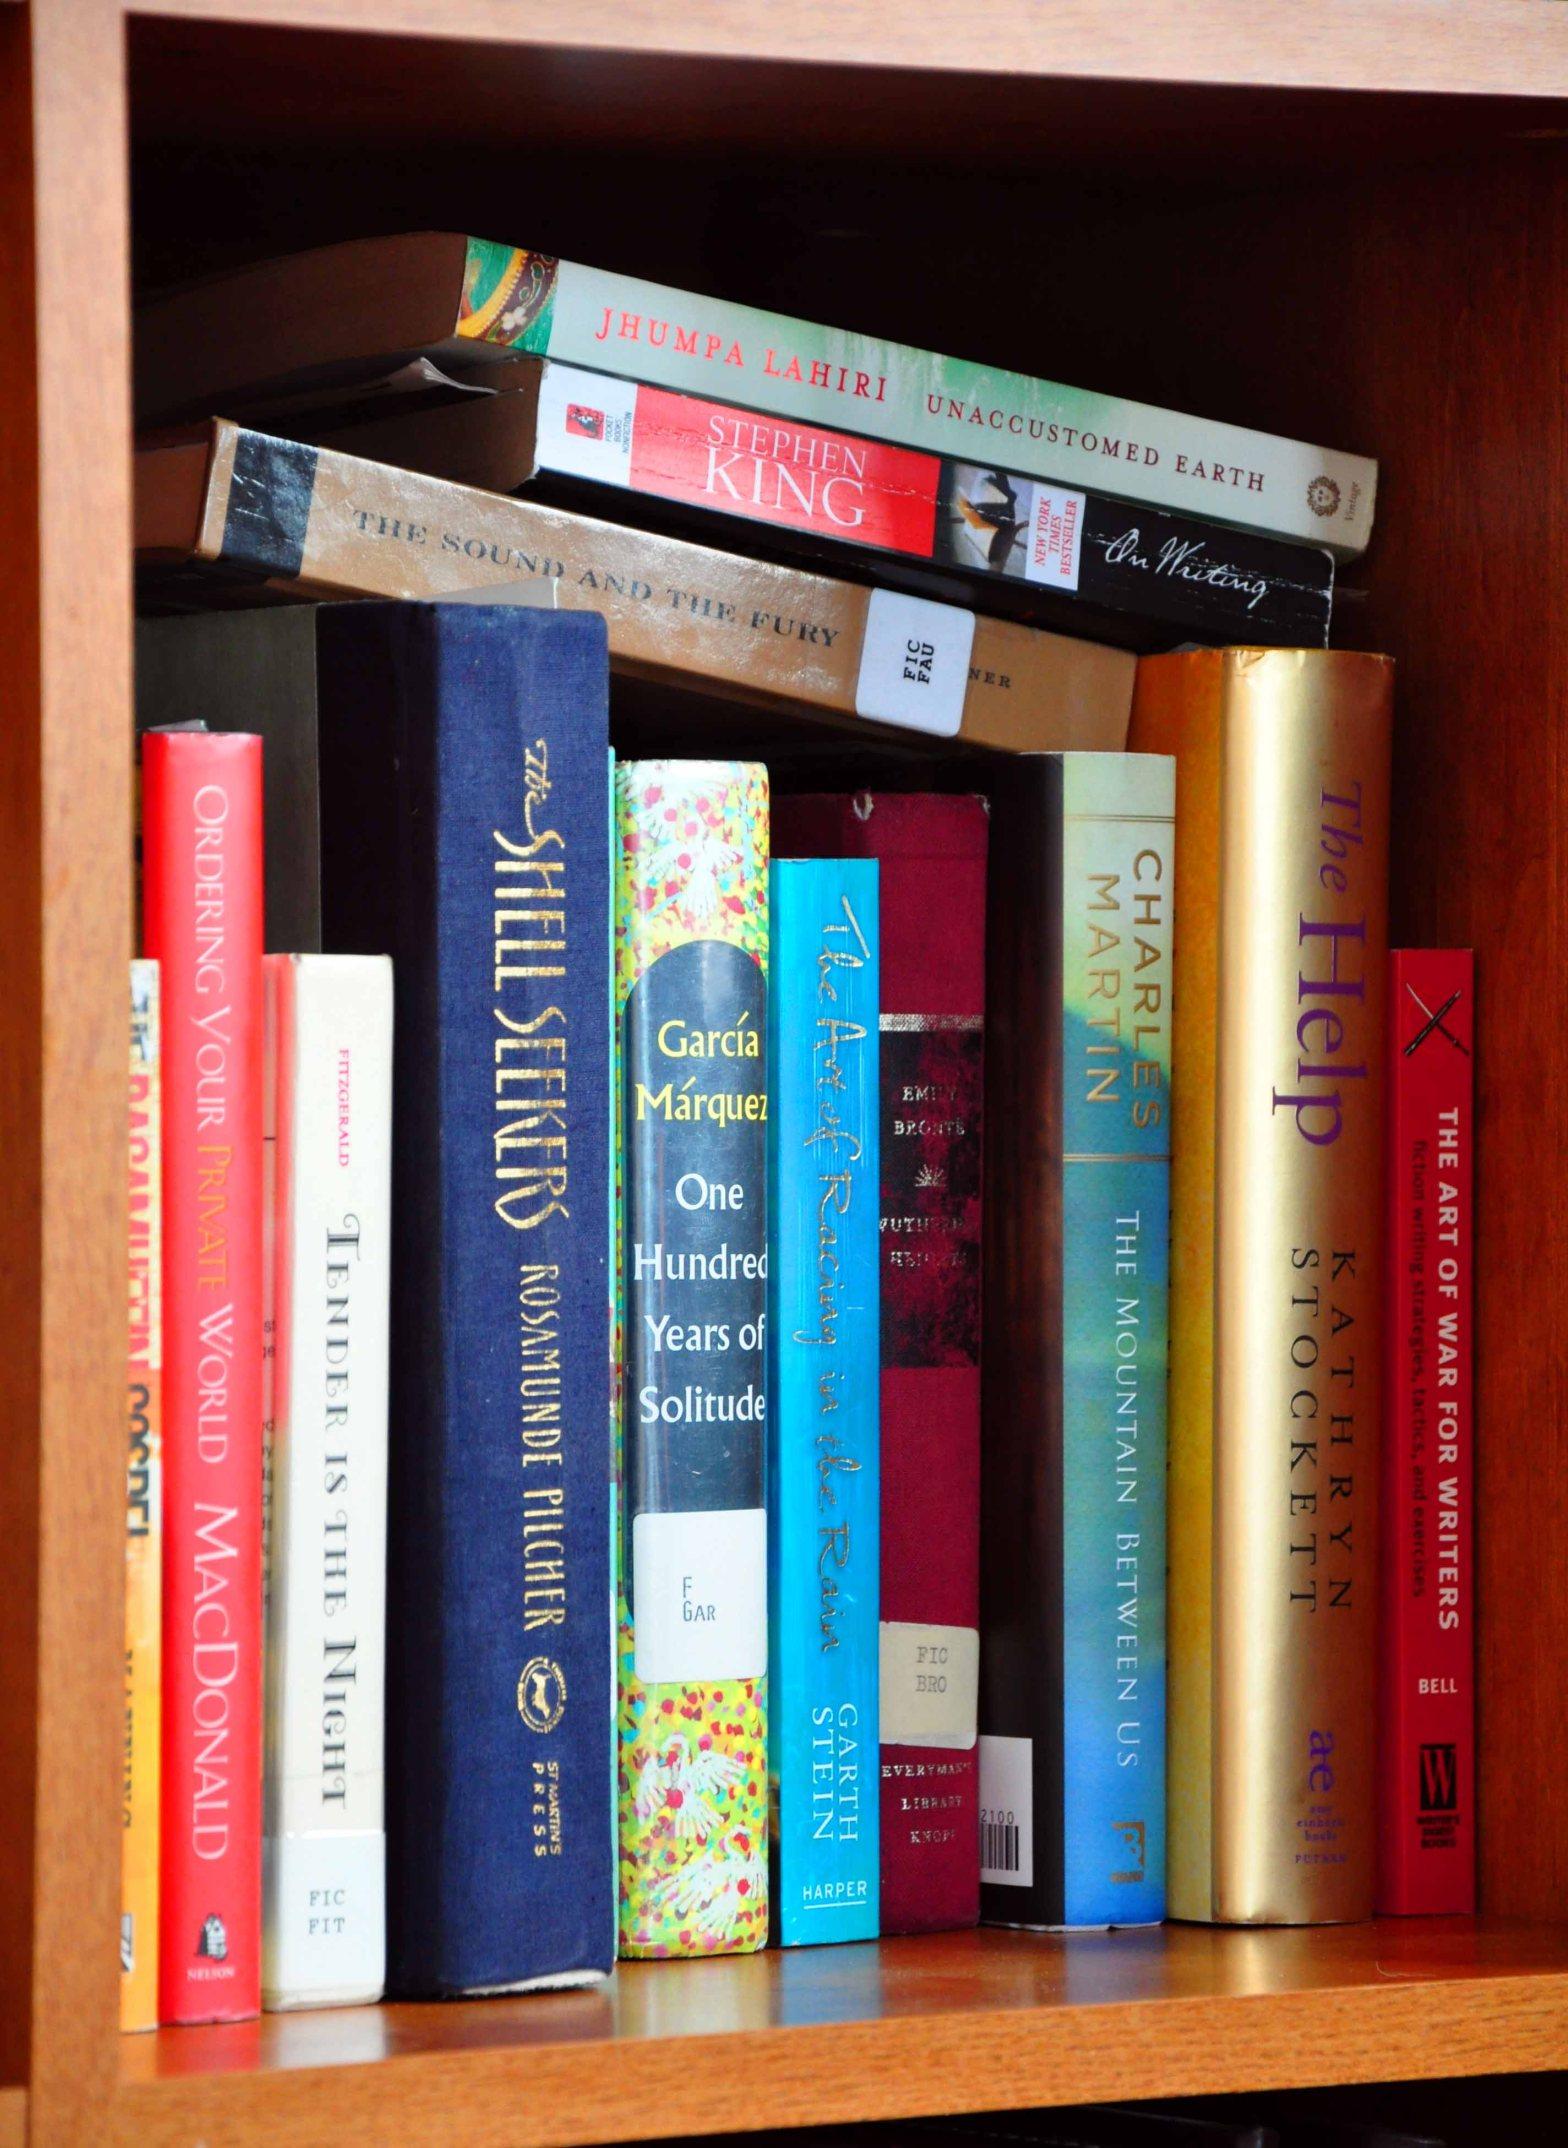 Recent Books I've Read